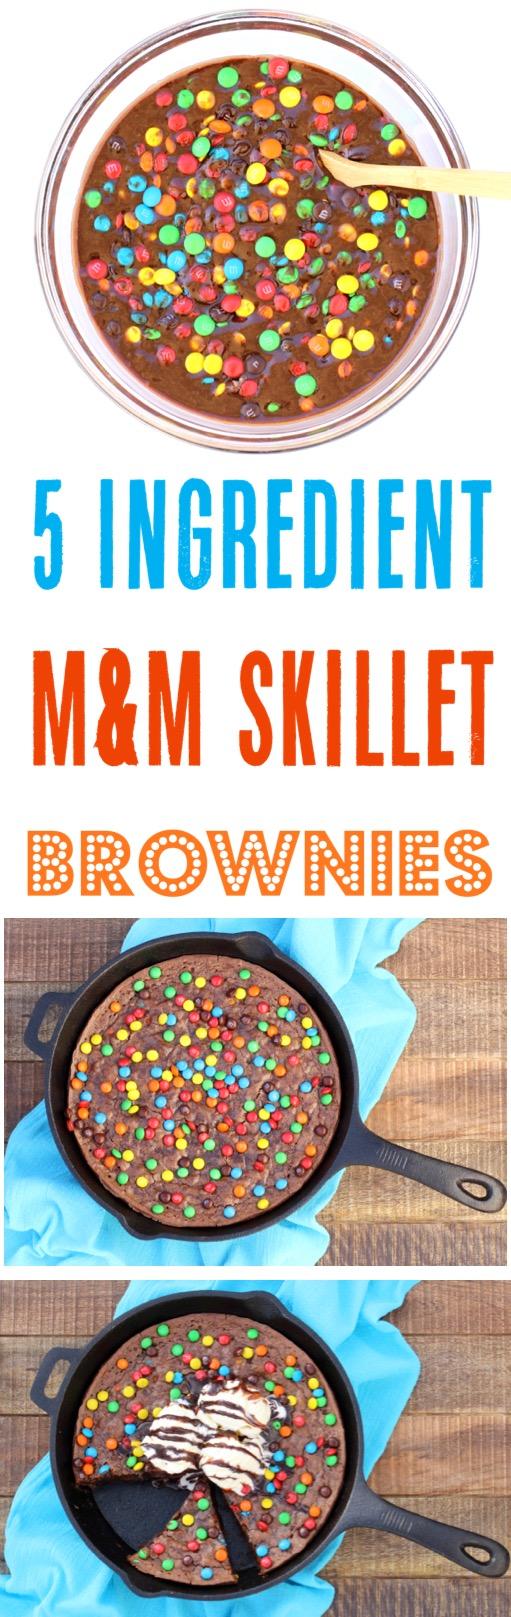 Skillet Brownie Cast Iron Recipe